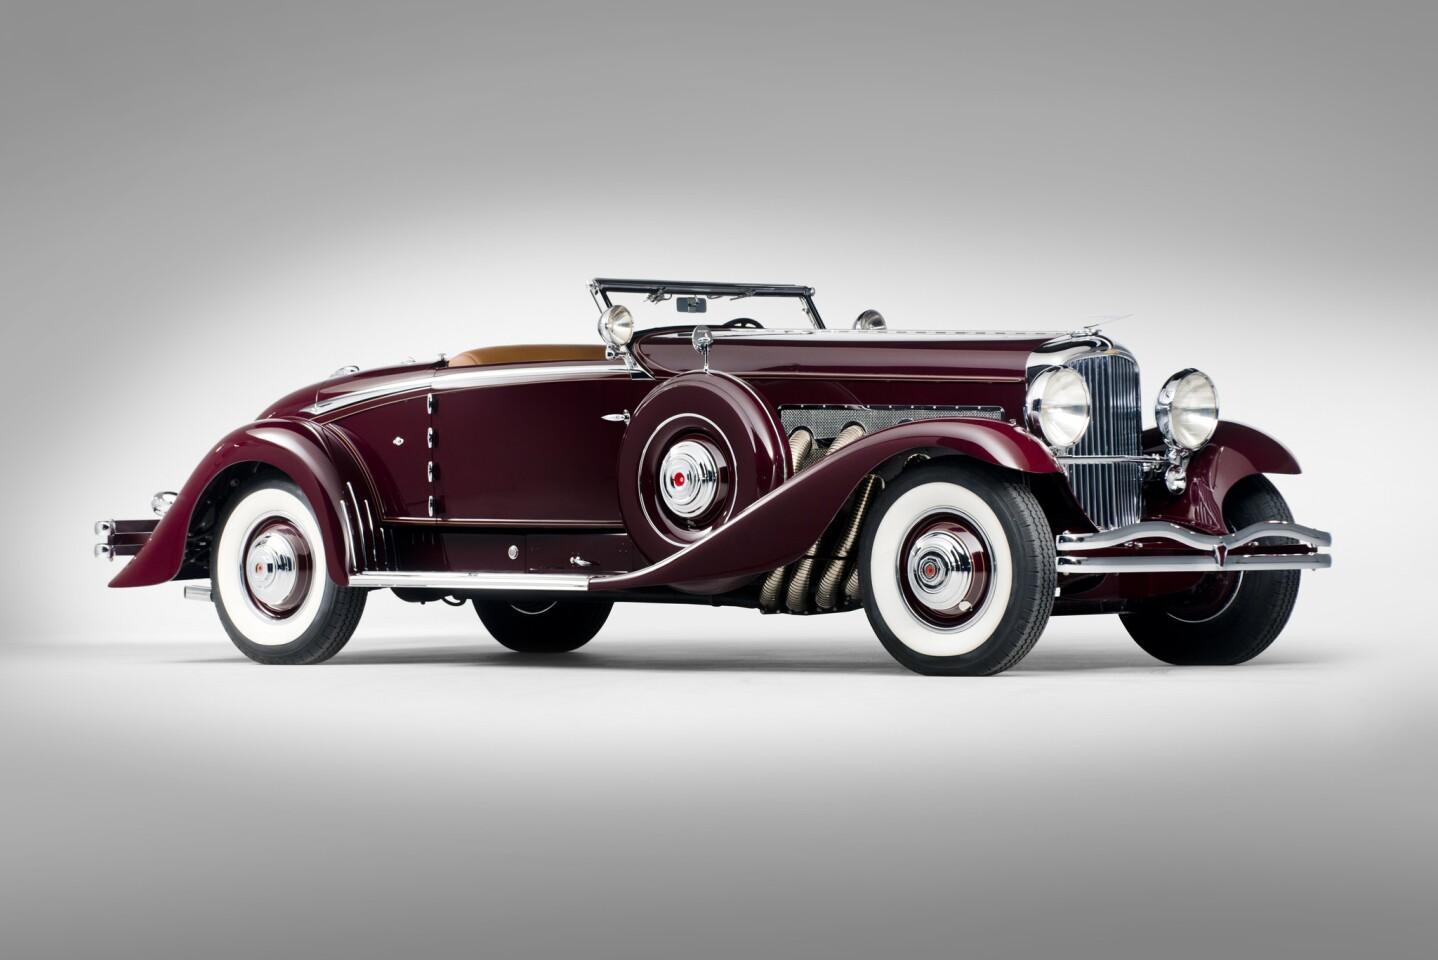 This 1935 Duesenberg Model SJ Walker-LaGrande Convertible Coupe has a pre-sale estimate of $3.5 million to $5 million.